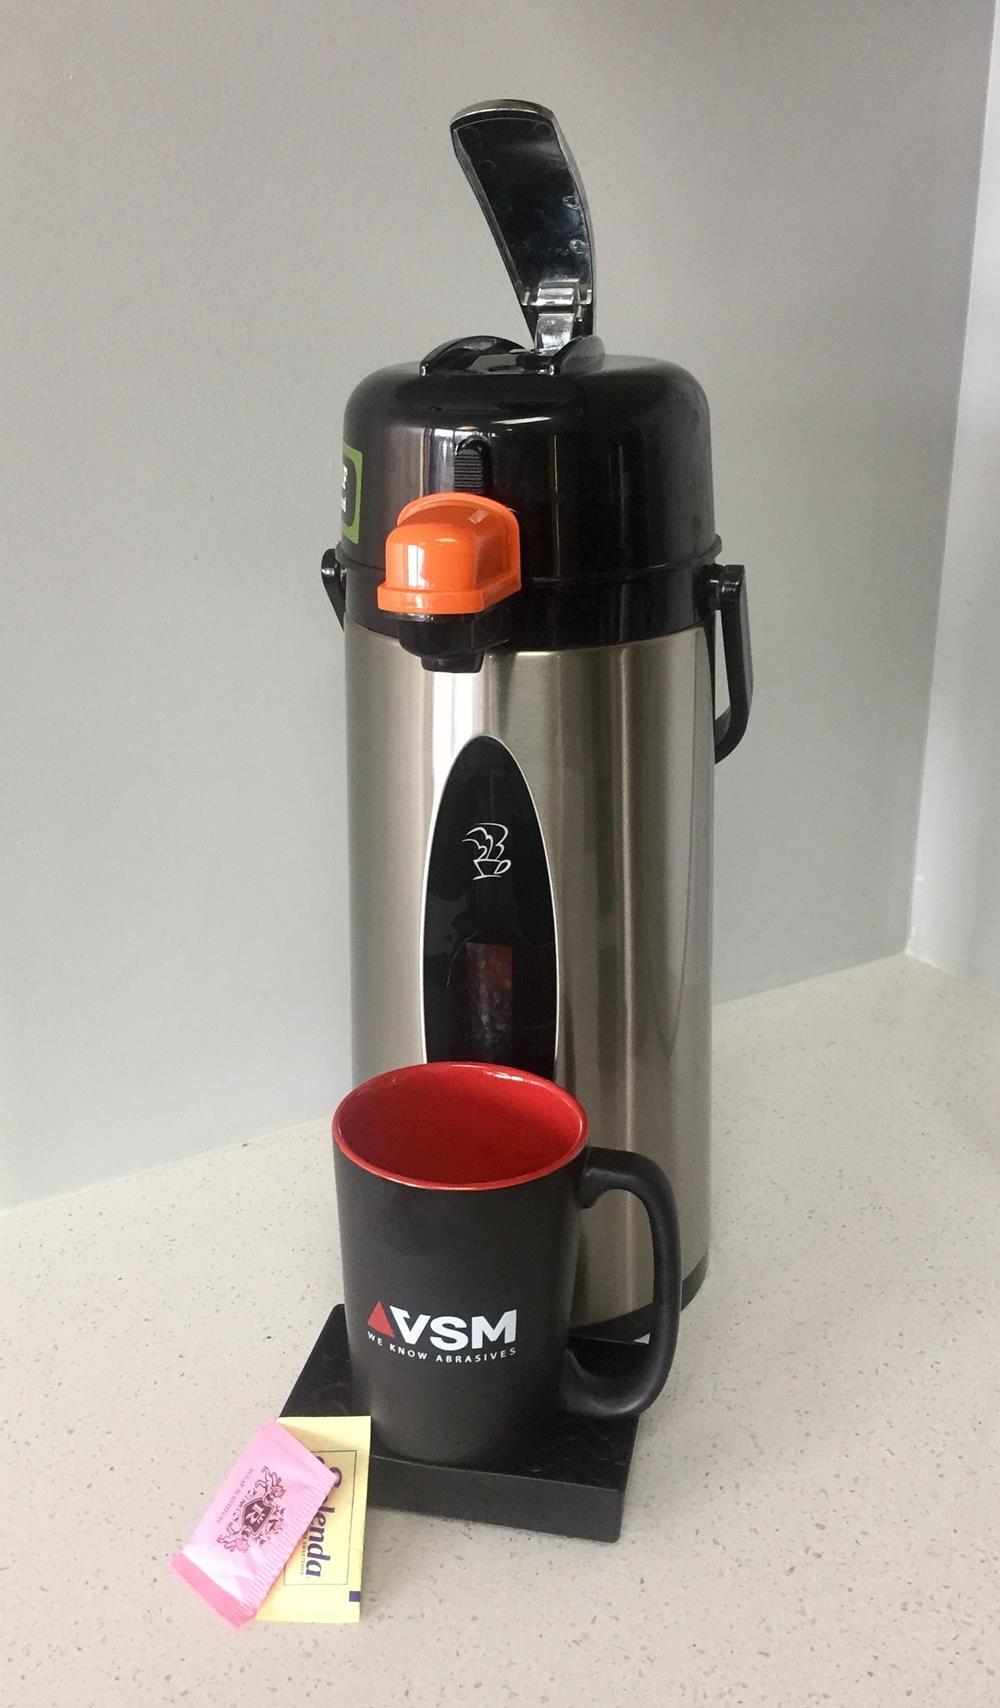 Coffee maker and black and red coffee mug